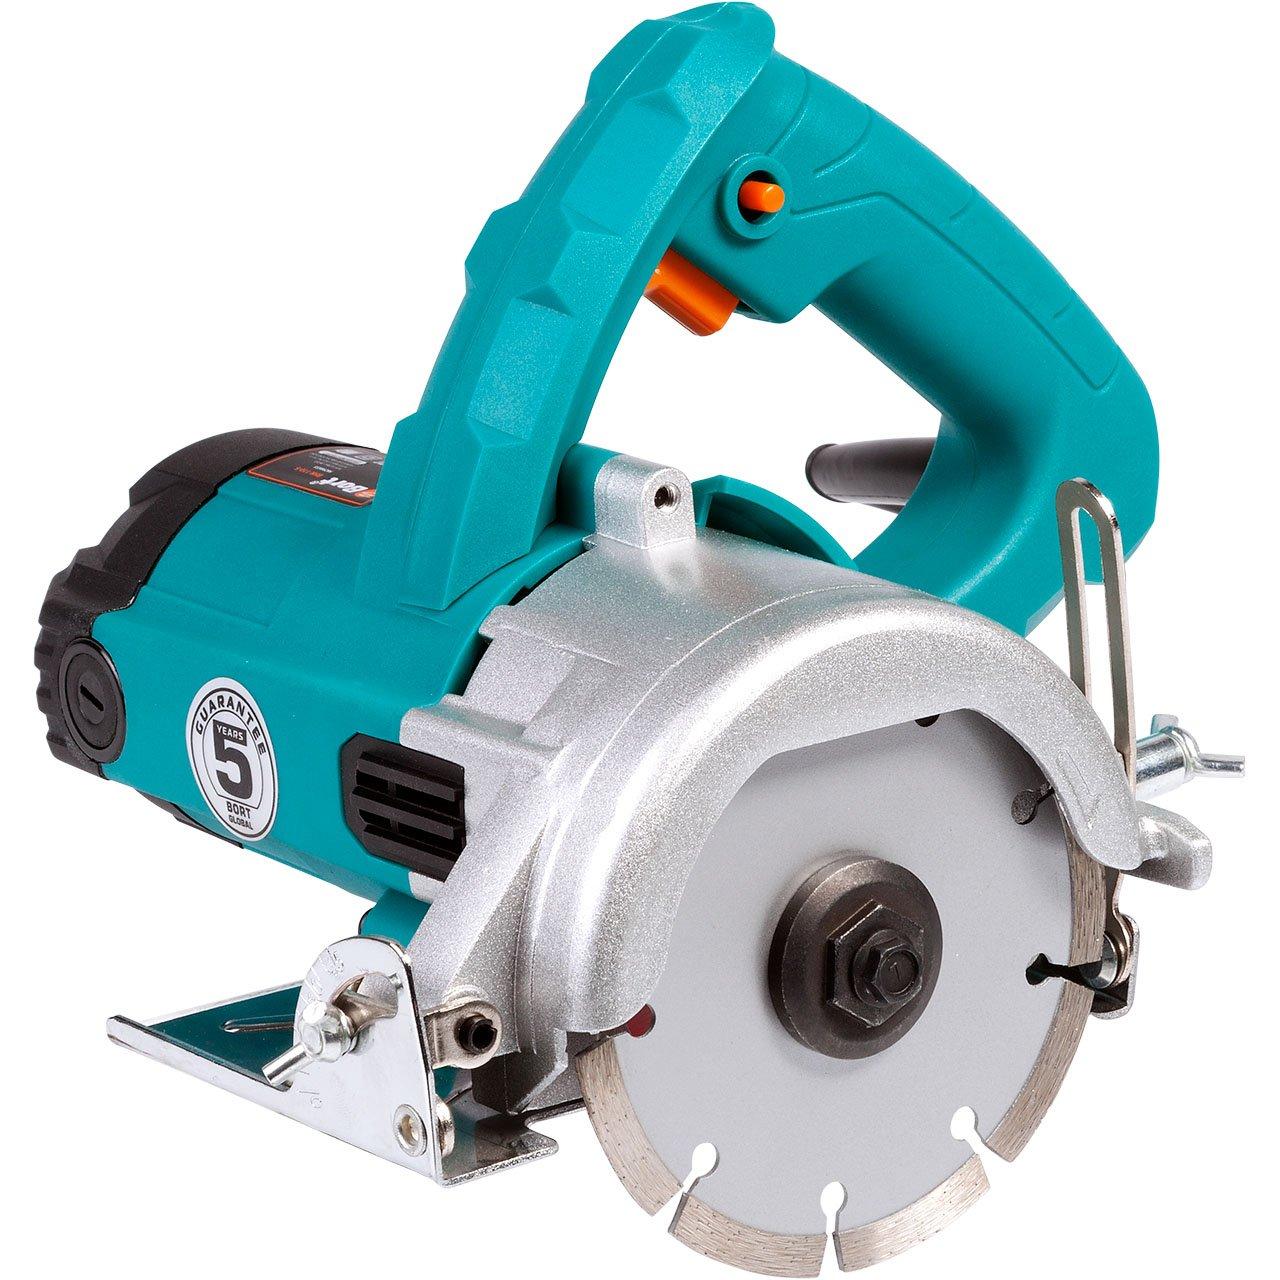 1200 W para piedra Bort BHK-110S Sierra circular 12000 rpm. /Ø 110//115 mm